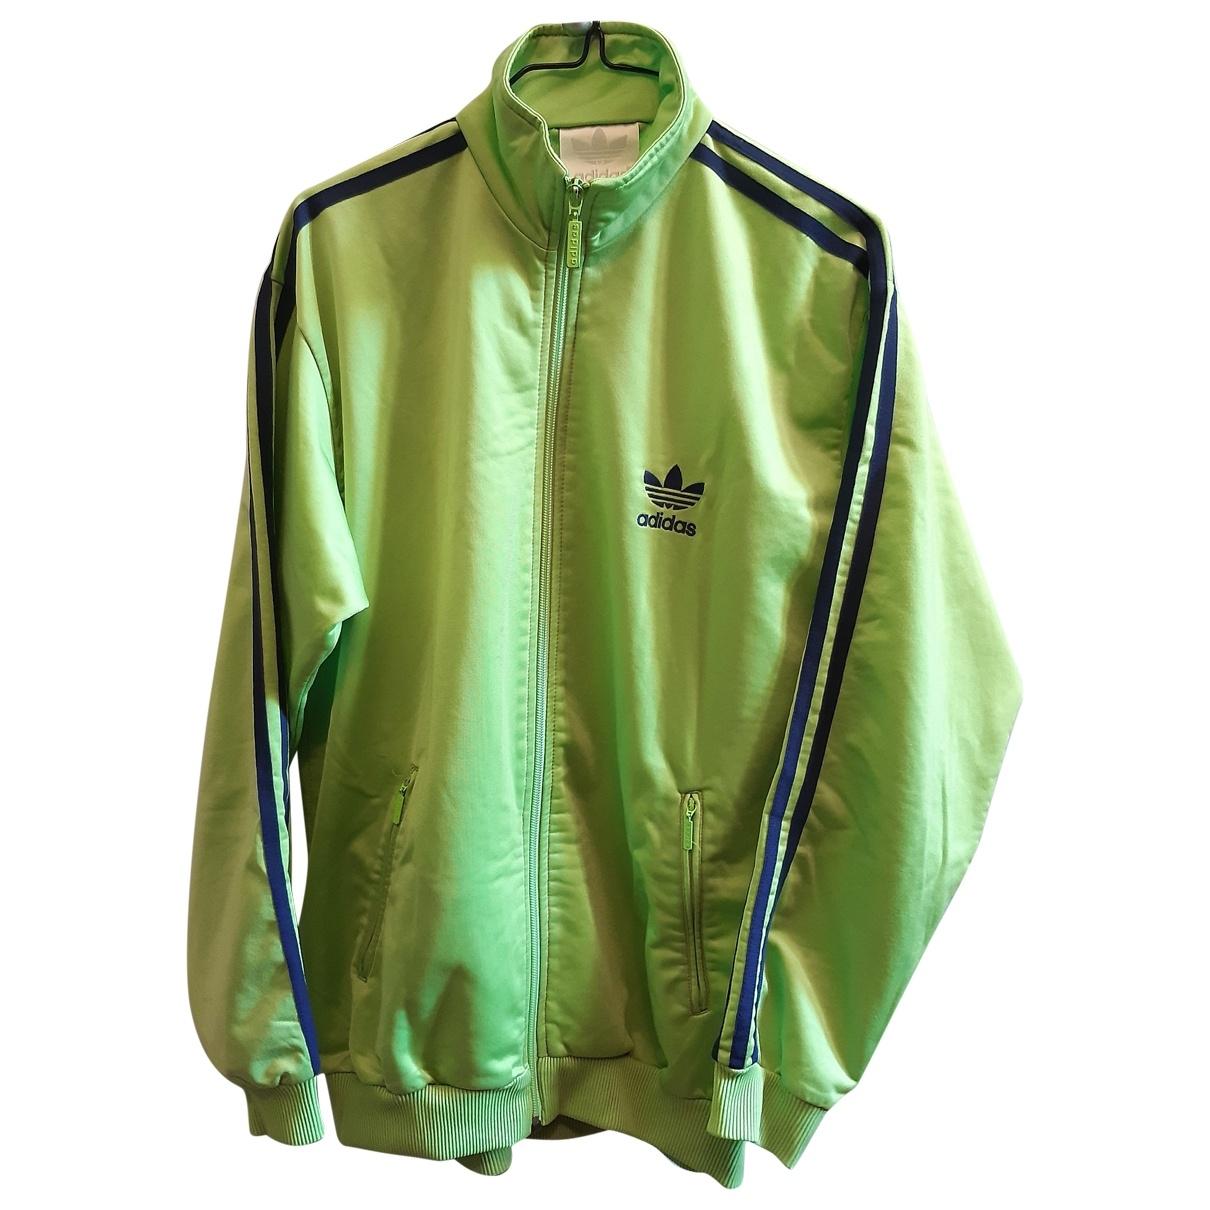 Adidas \N Green Knitwear & Sweatshirts for Men M International